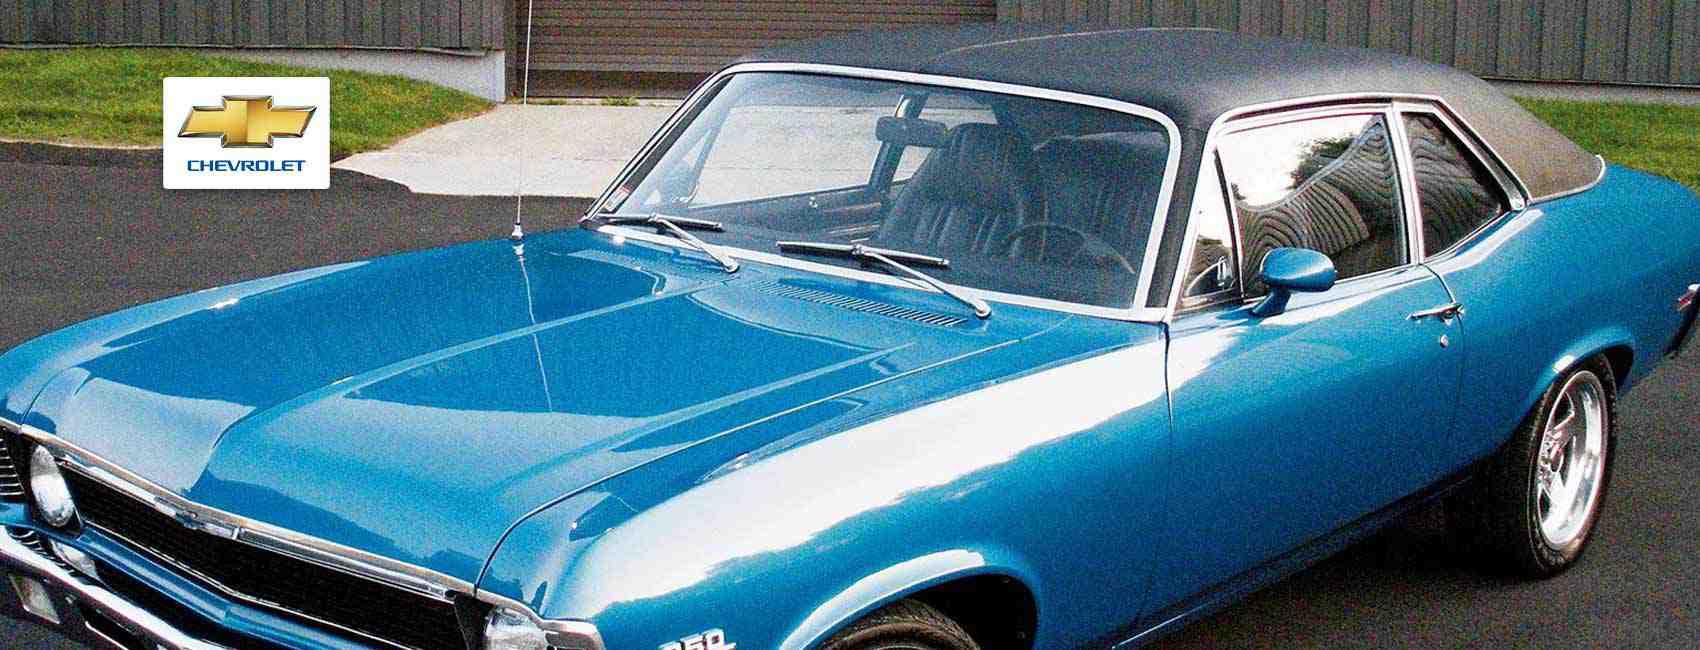 Chevy Nova Parts - Buy Used Chevy Nova Parts Online @ Best Price